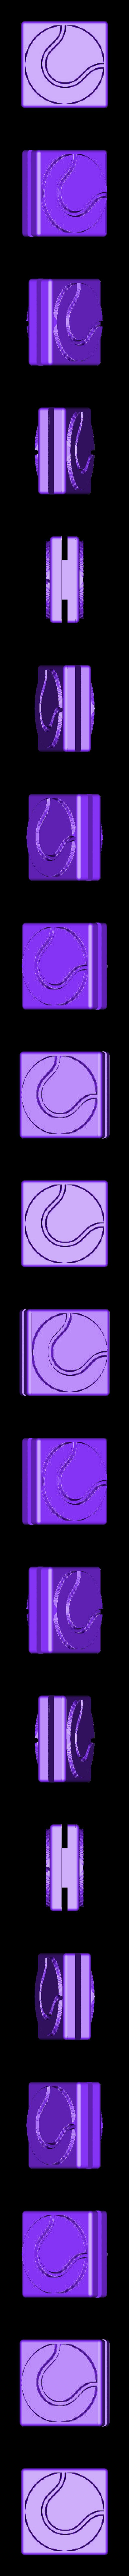 Tennis_ball_2S.stl Download free STL file Tennis String Vibration Dampener with your LOGO! • 3D printing design, sportguy3Dprint